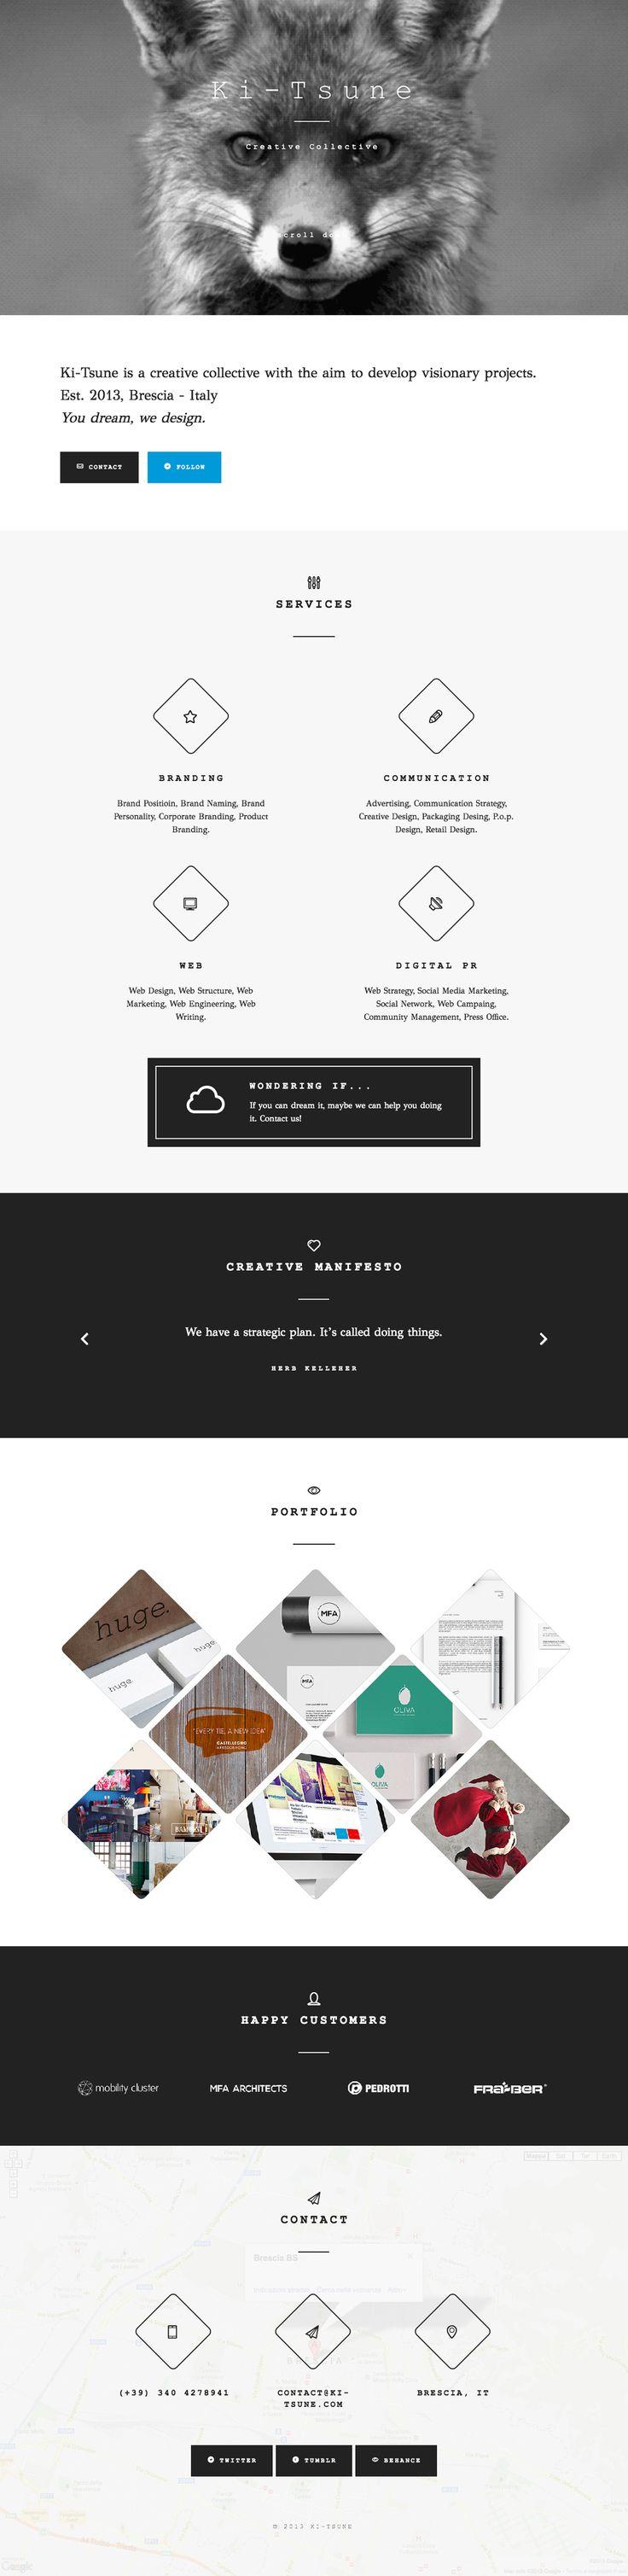 Responsive one page portfolio for digital agency 'Ki-Tsune' with a full screen GIF intro of a fox.